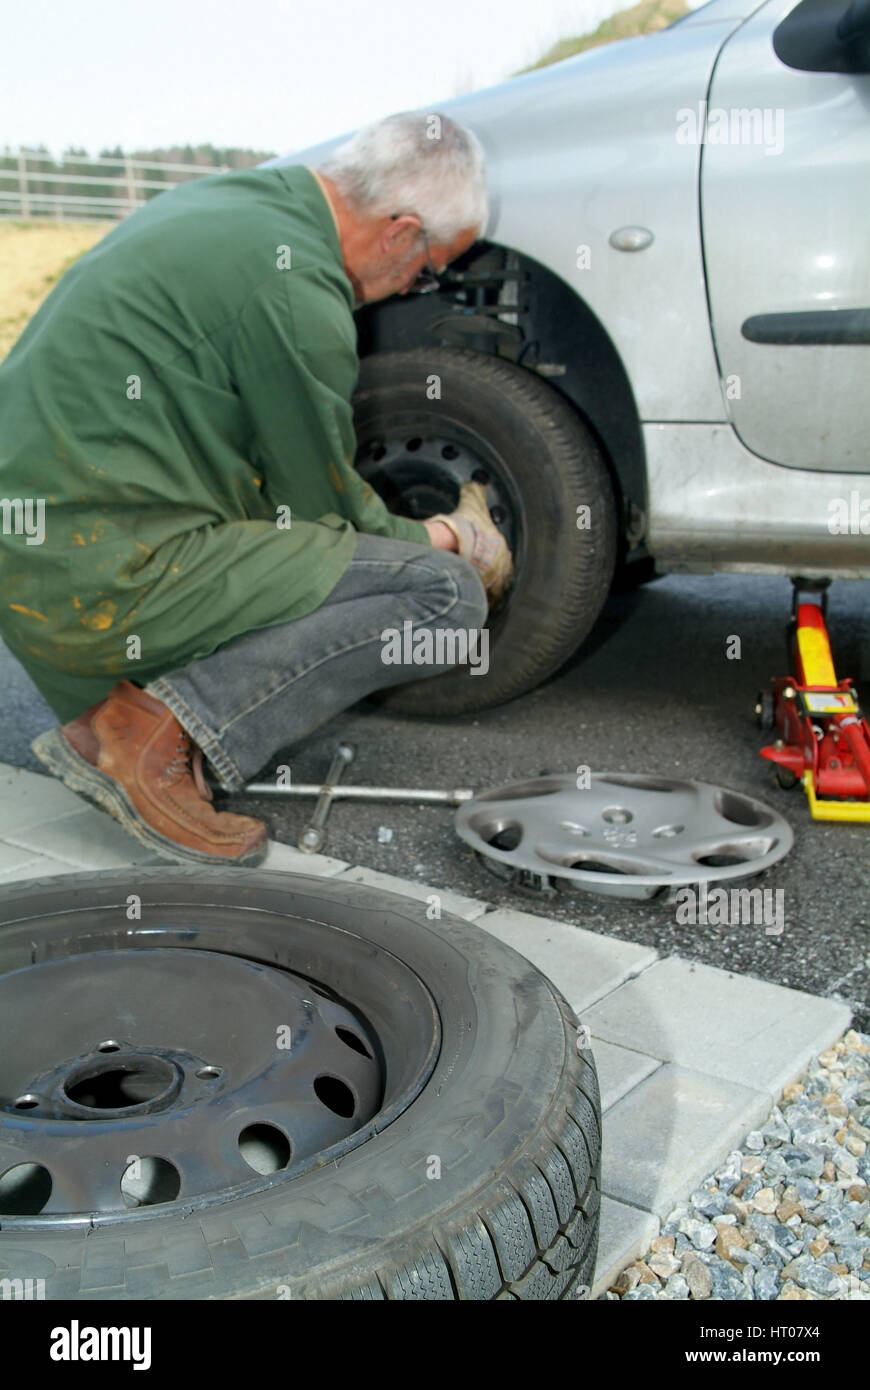 Reifenwechsel - tire change Stock Photo